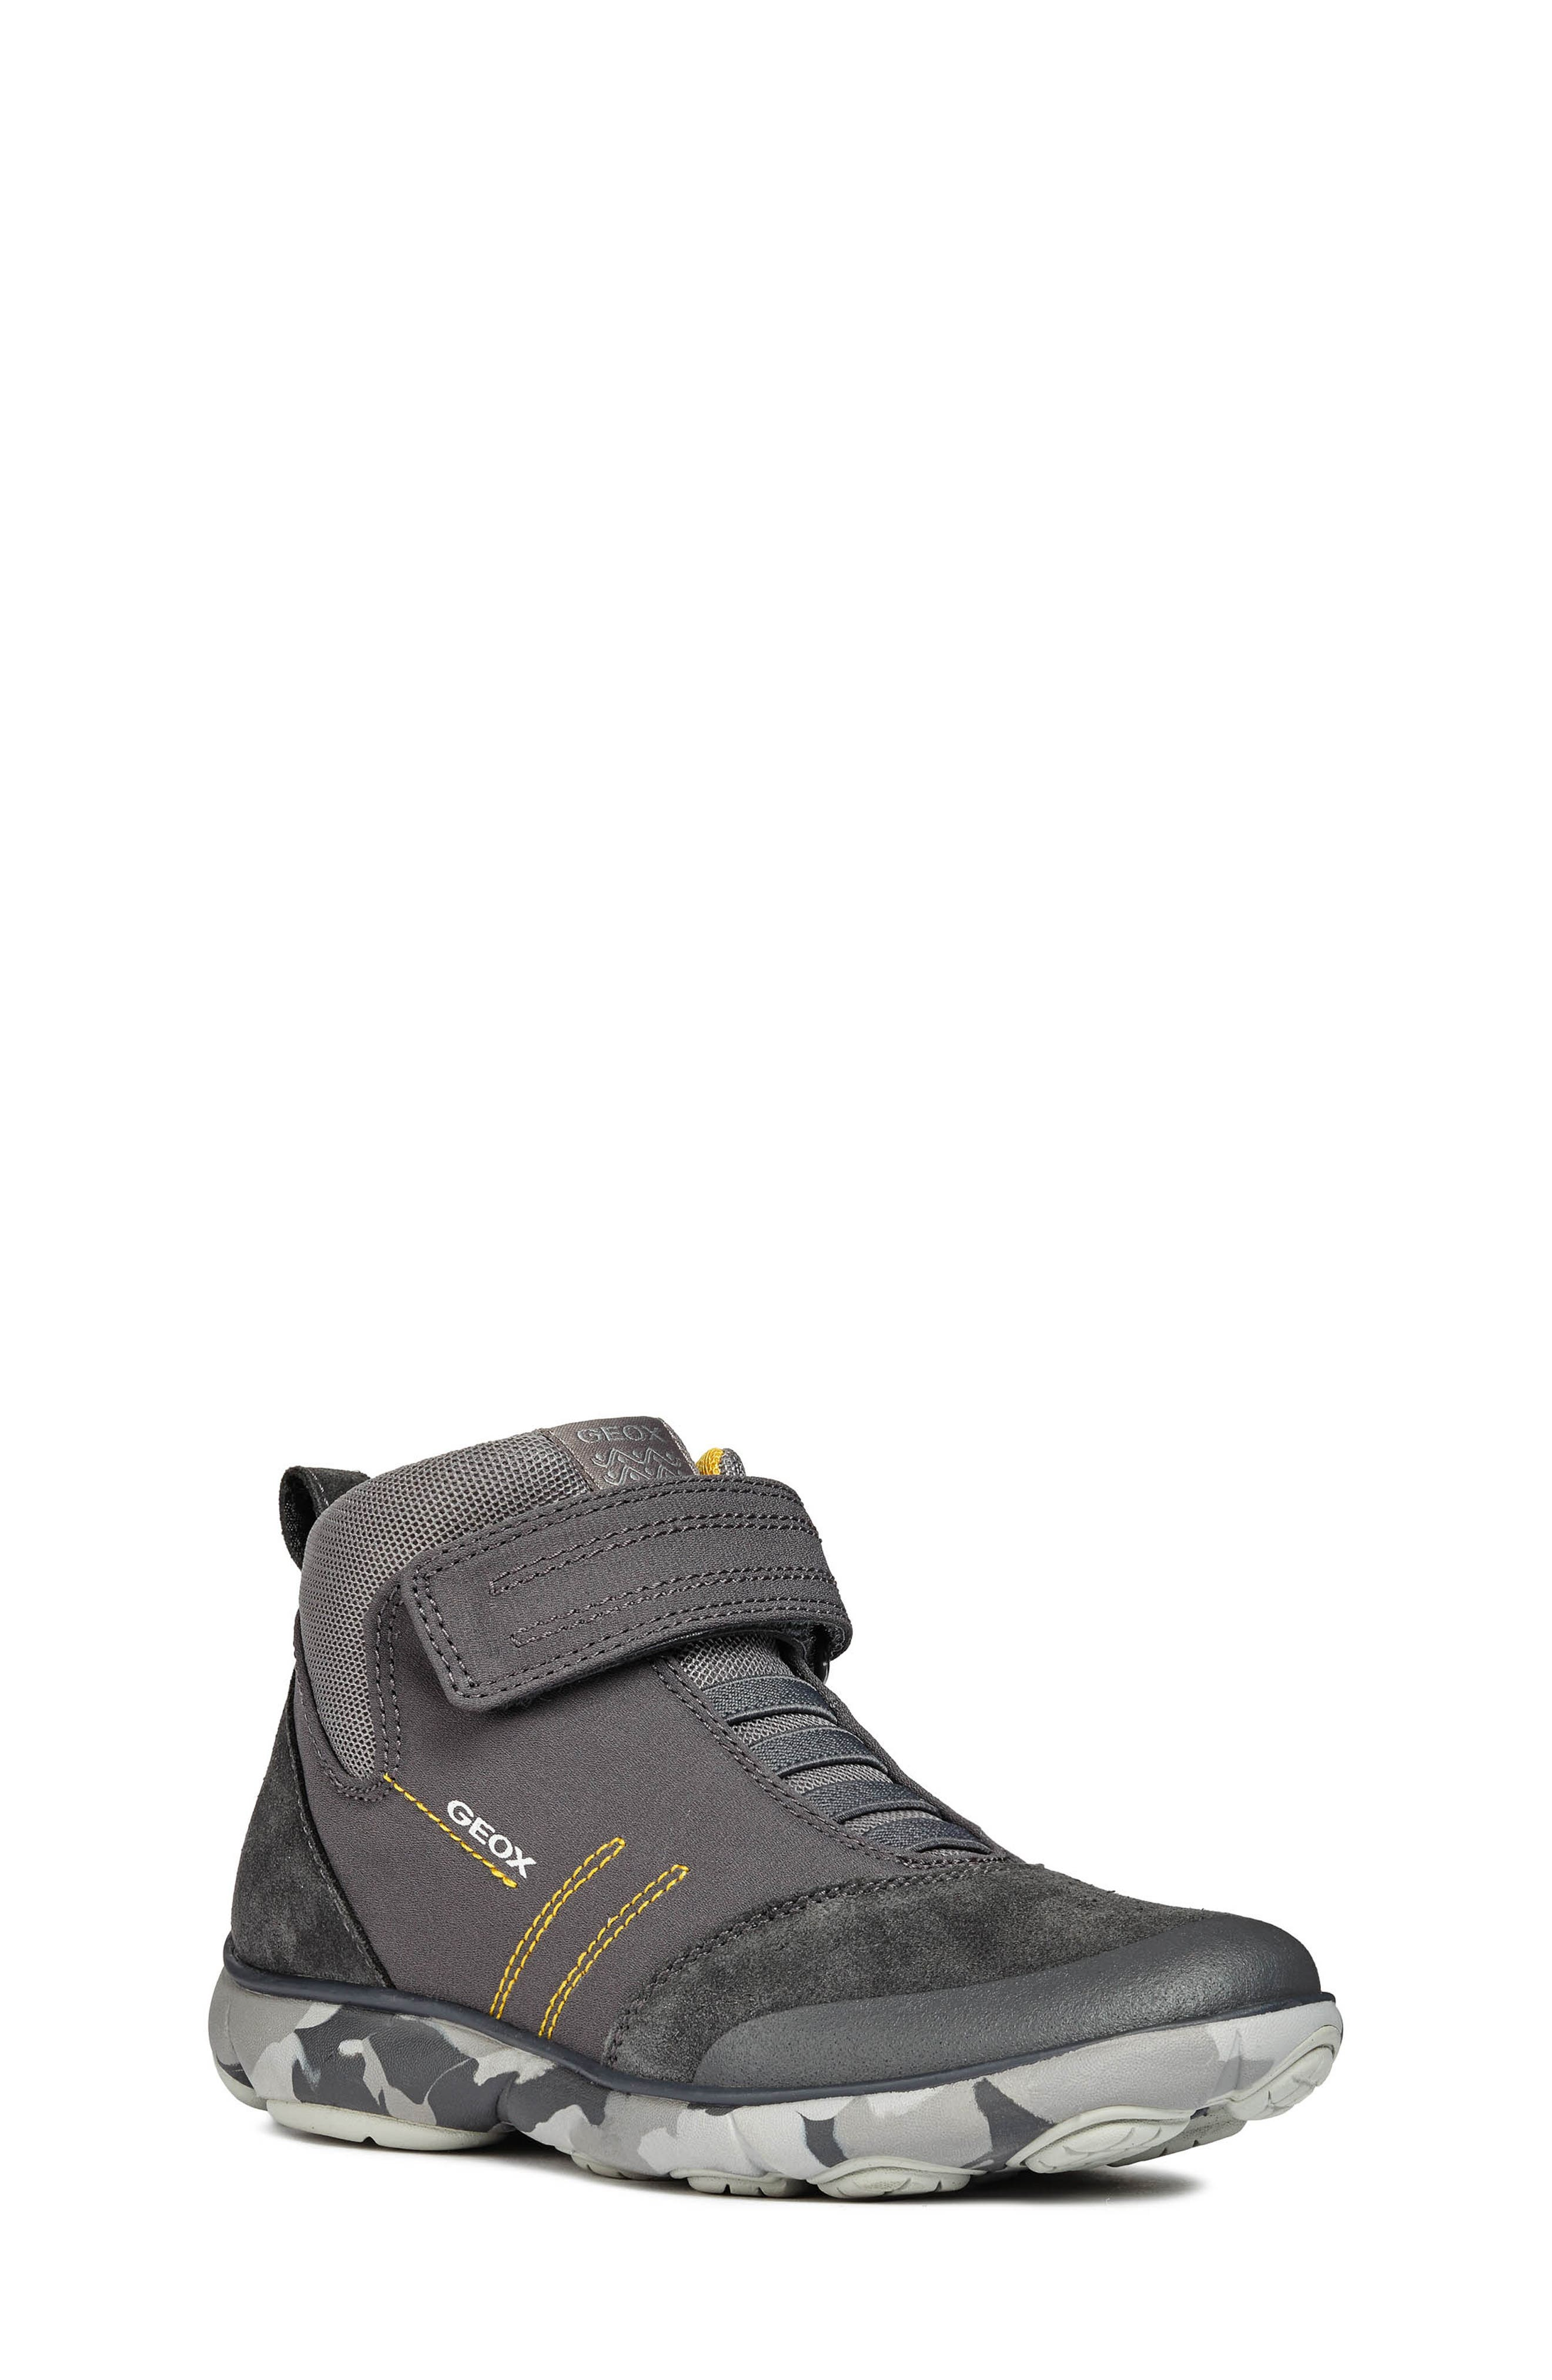 Nebula Boot,                         Main,                         color, GREY/YELLOW